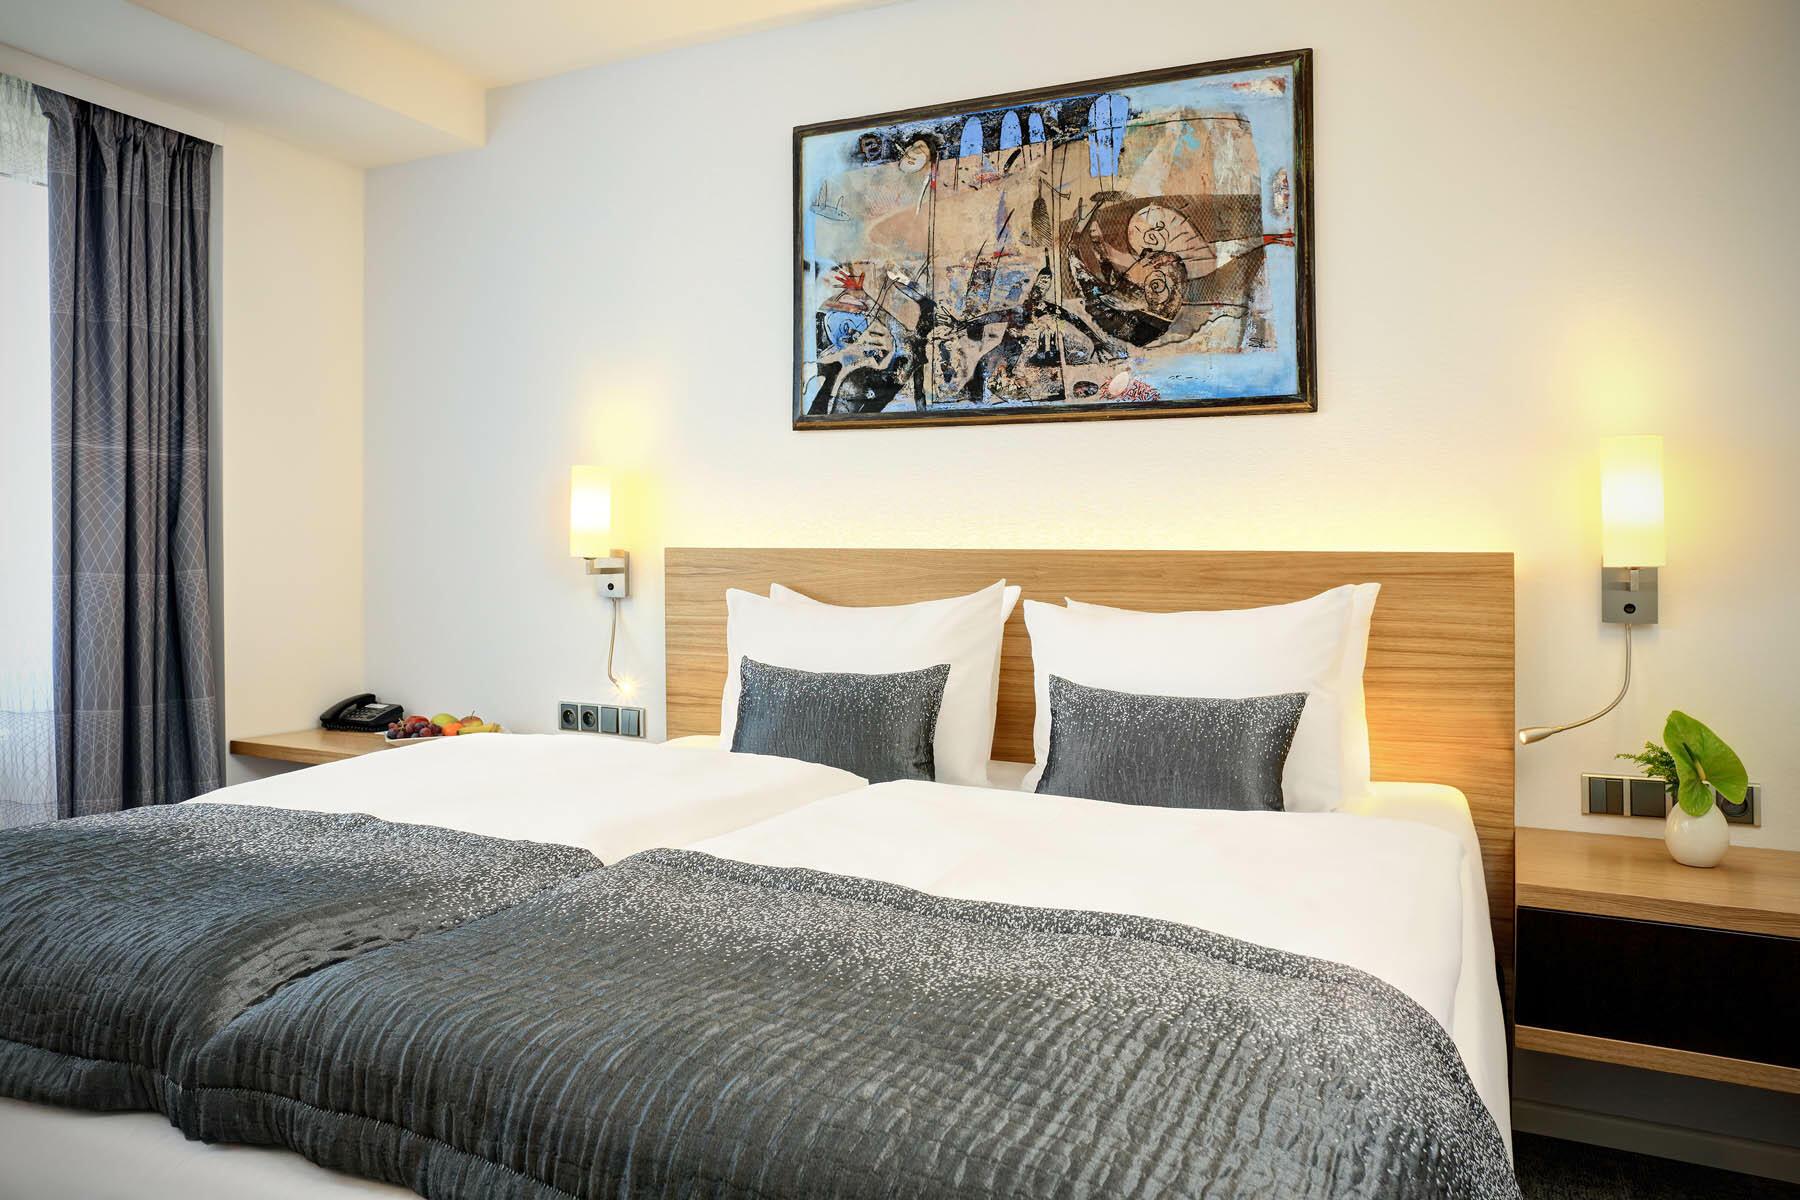 Presidential Suite Bedroom,  Hotel Duo, Prague 9, Czech Republic